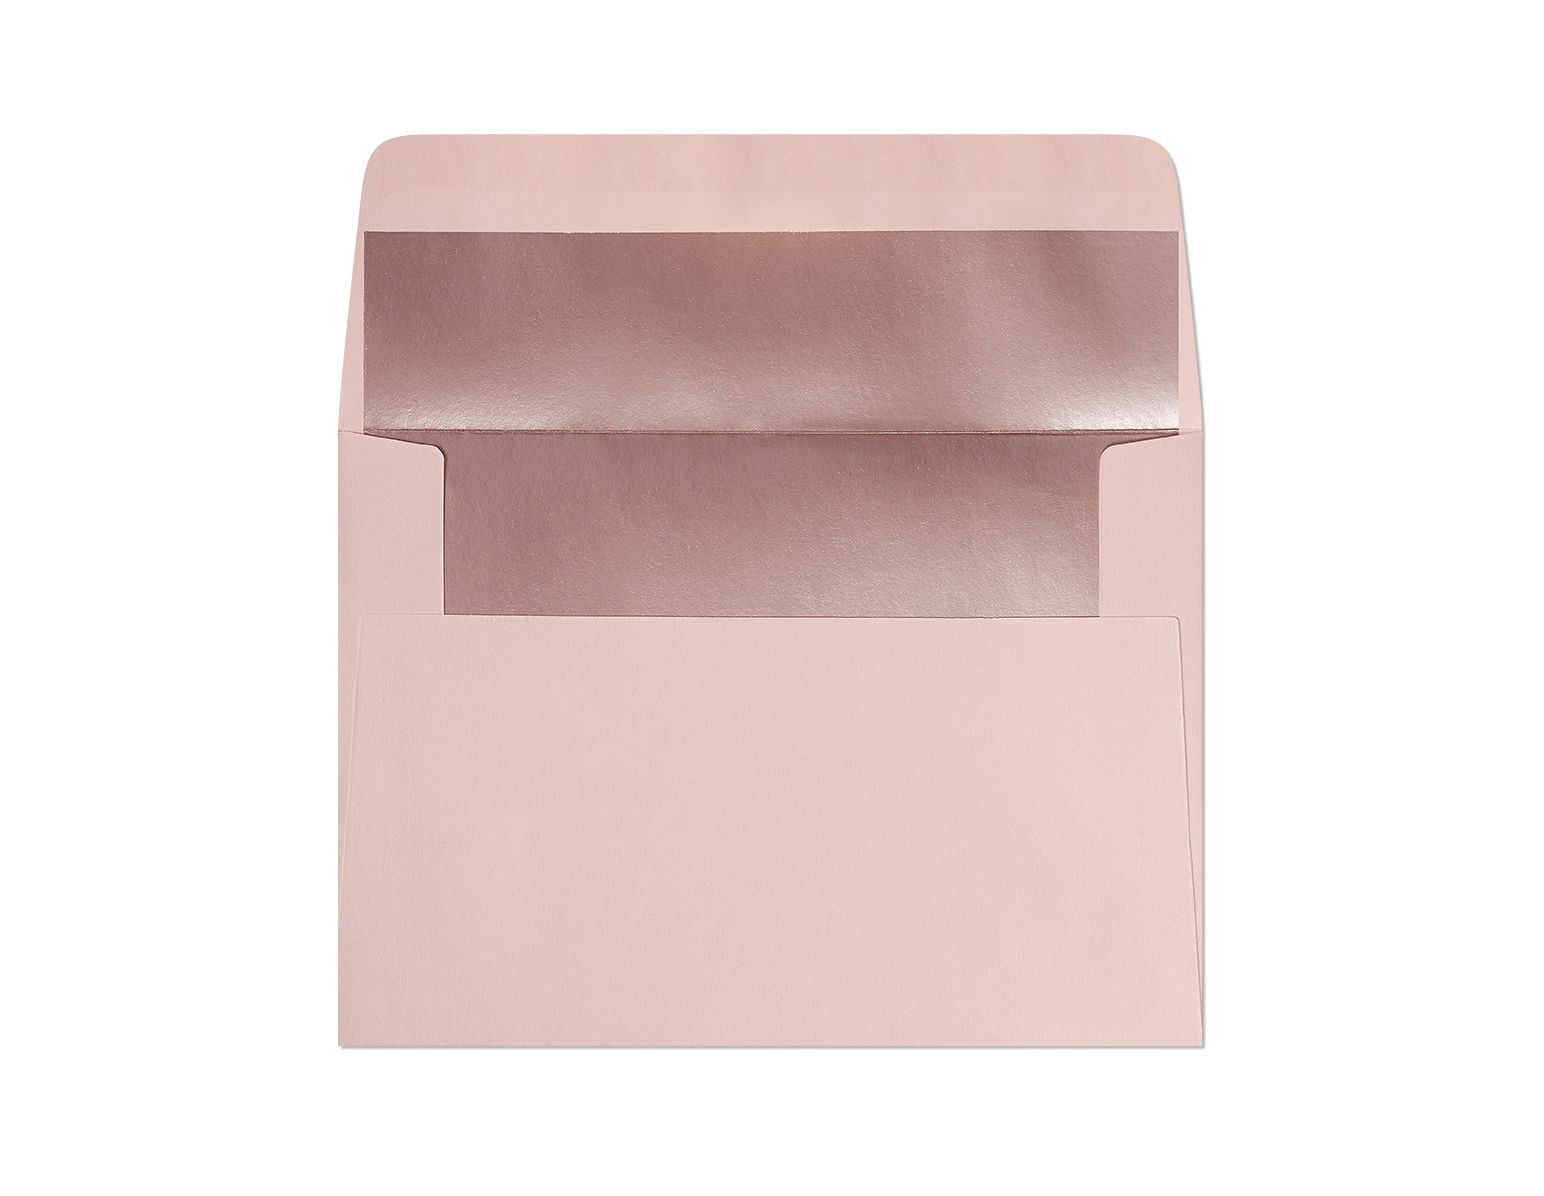 Galeria Papieru obálky C6 s metalickým vnitřkem růžová 120g, 10ks